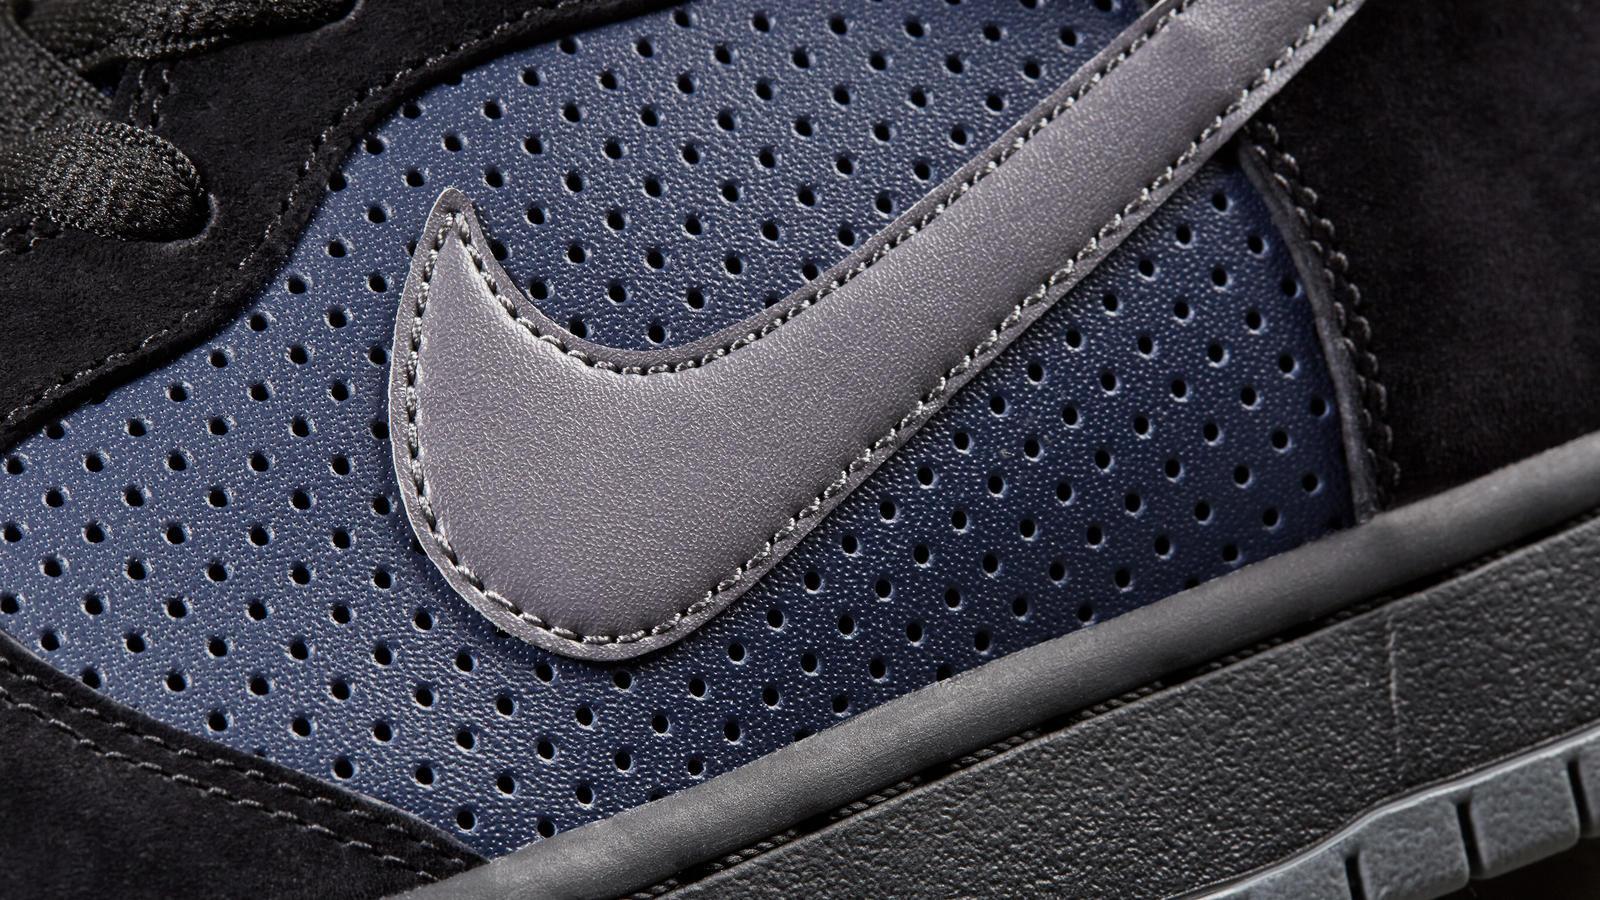 sports shoes 0a1bd 4bf37 ... 170320 footwear sb blk navy dunk 0280 native 1600 ...